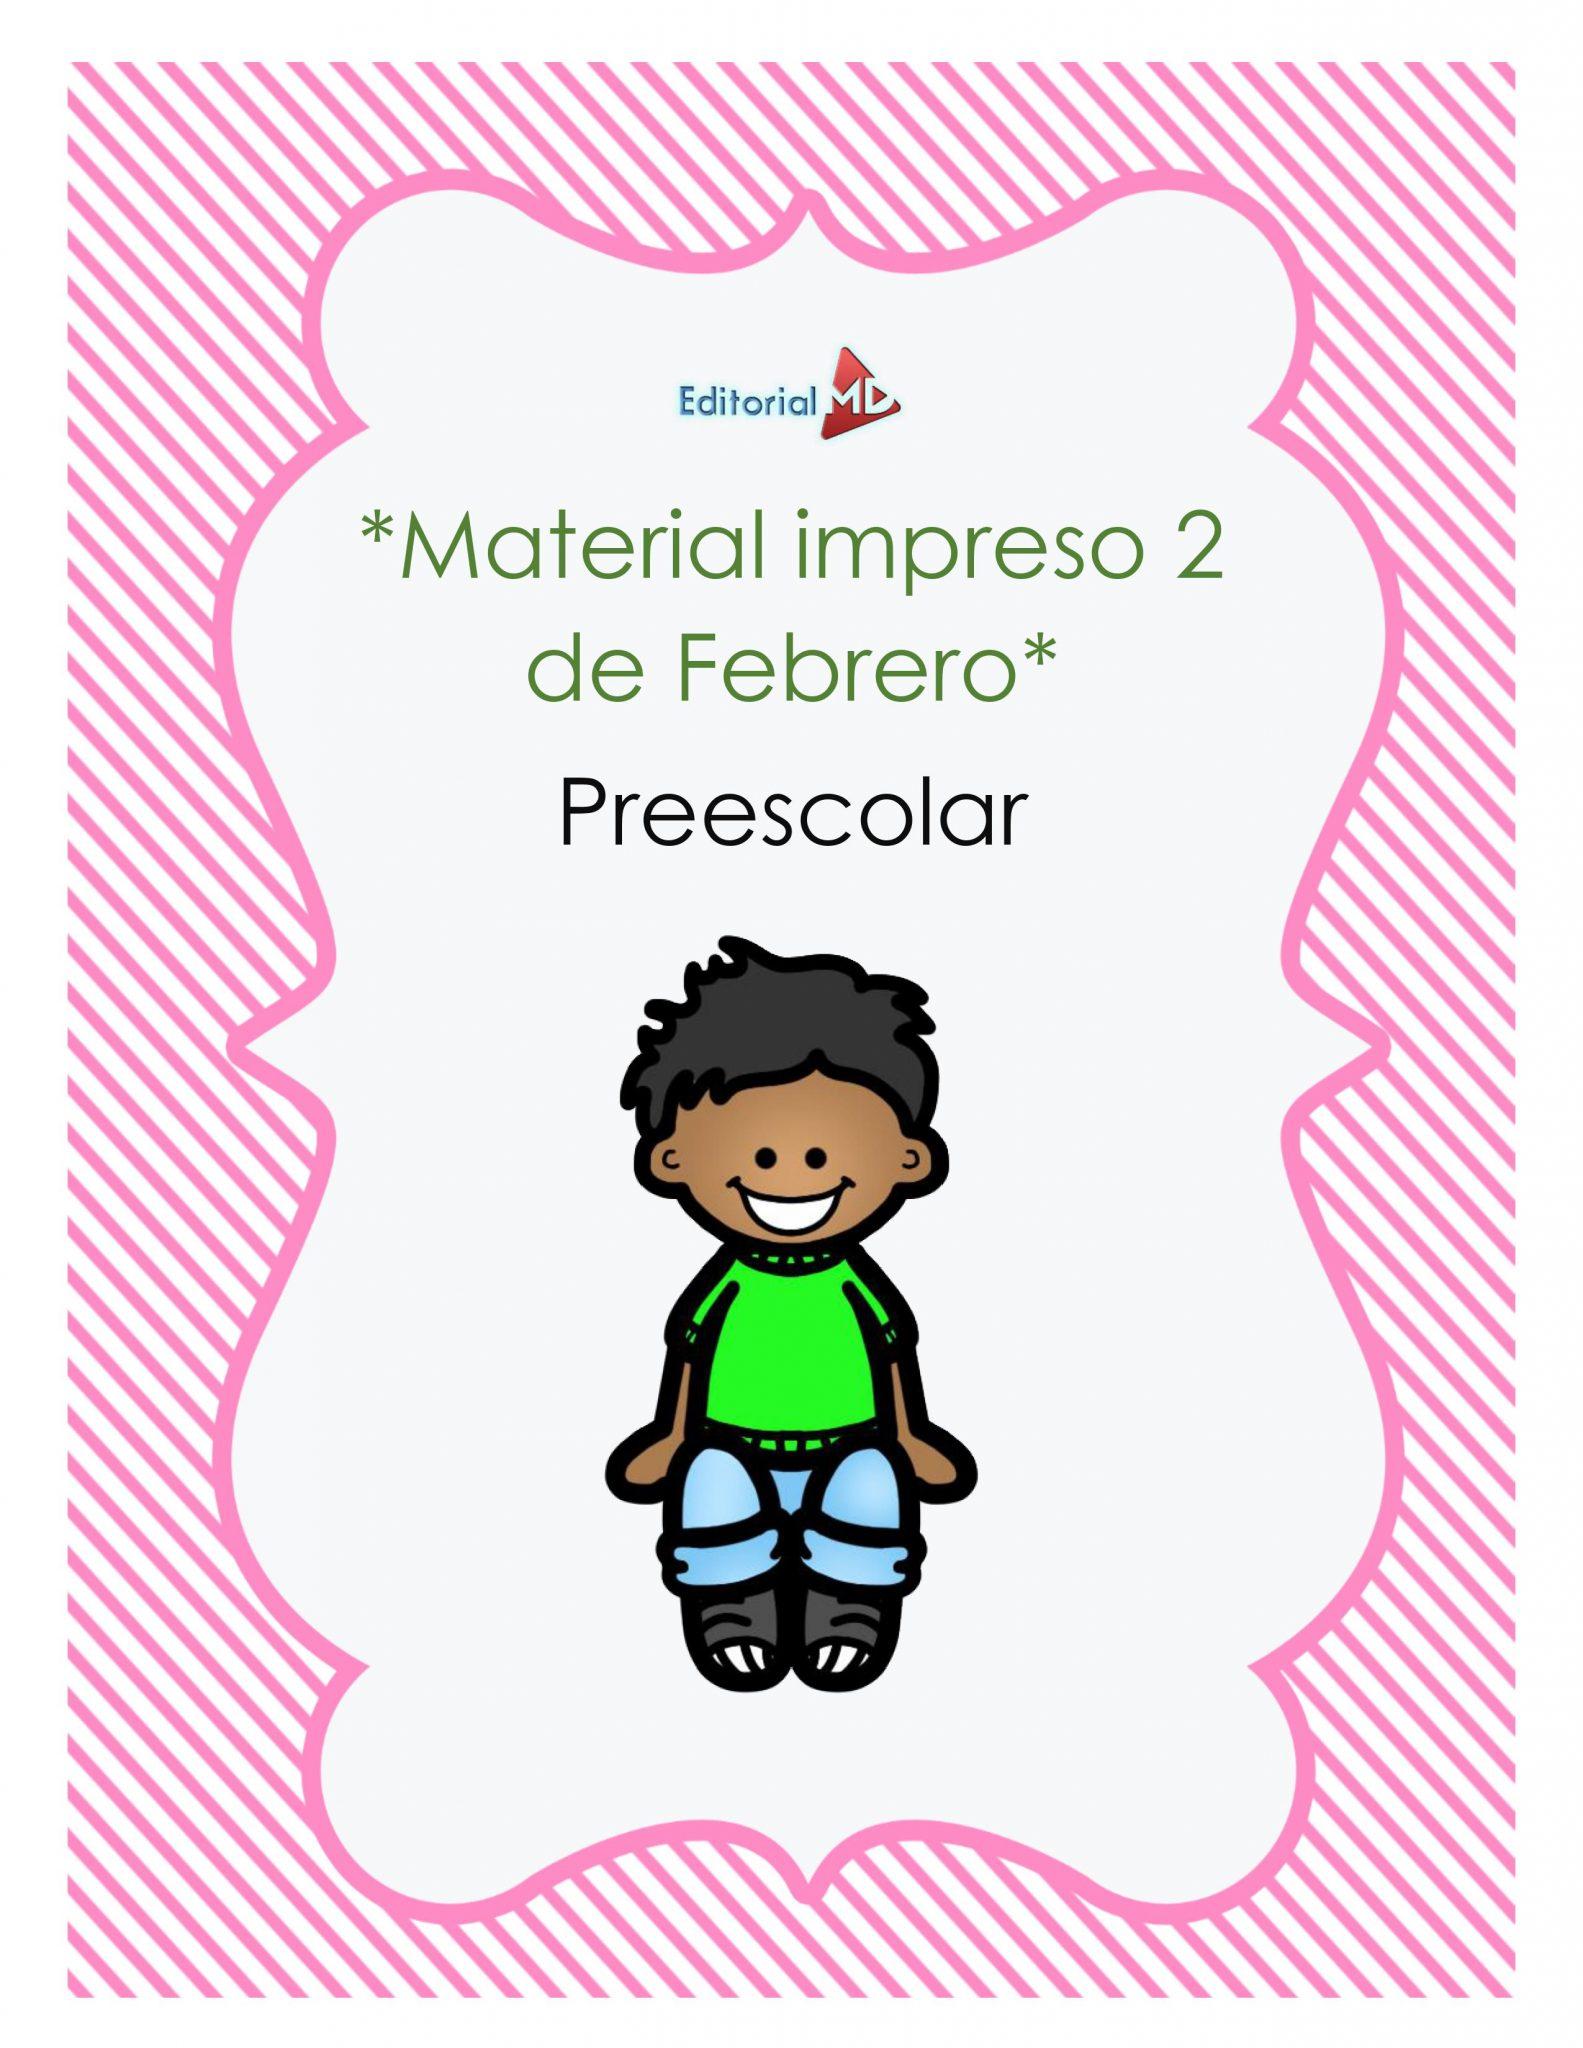 Ejemplo Material de apoyo semana 21 preescolar 01